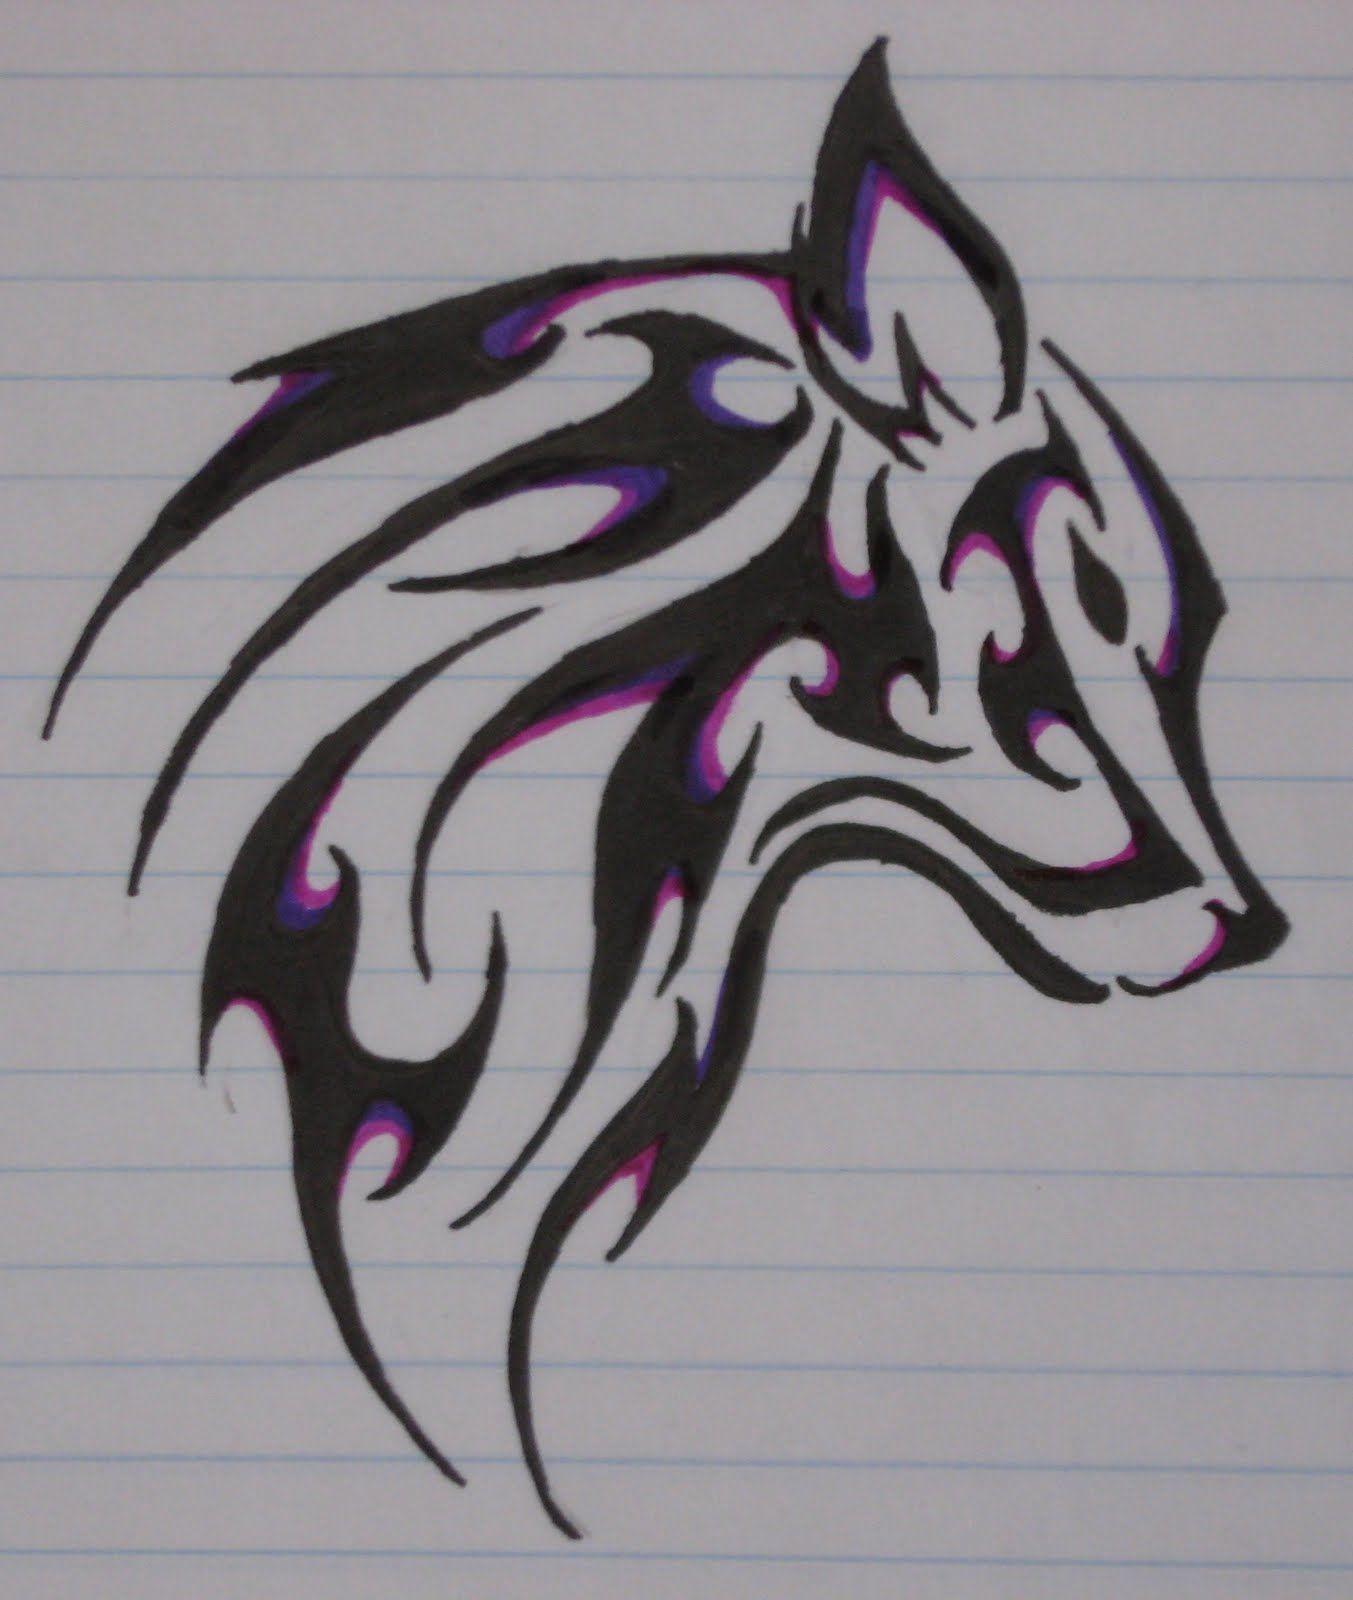 c0f4279db Wolf Tattoo, All My Favorite Colors.... Purple,Blue,and Black ...